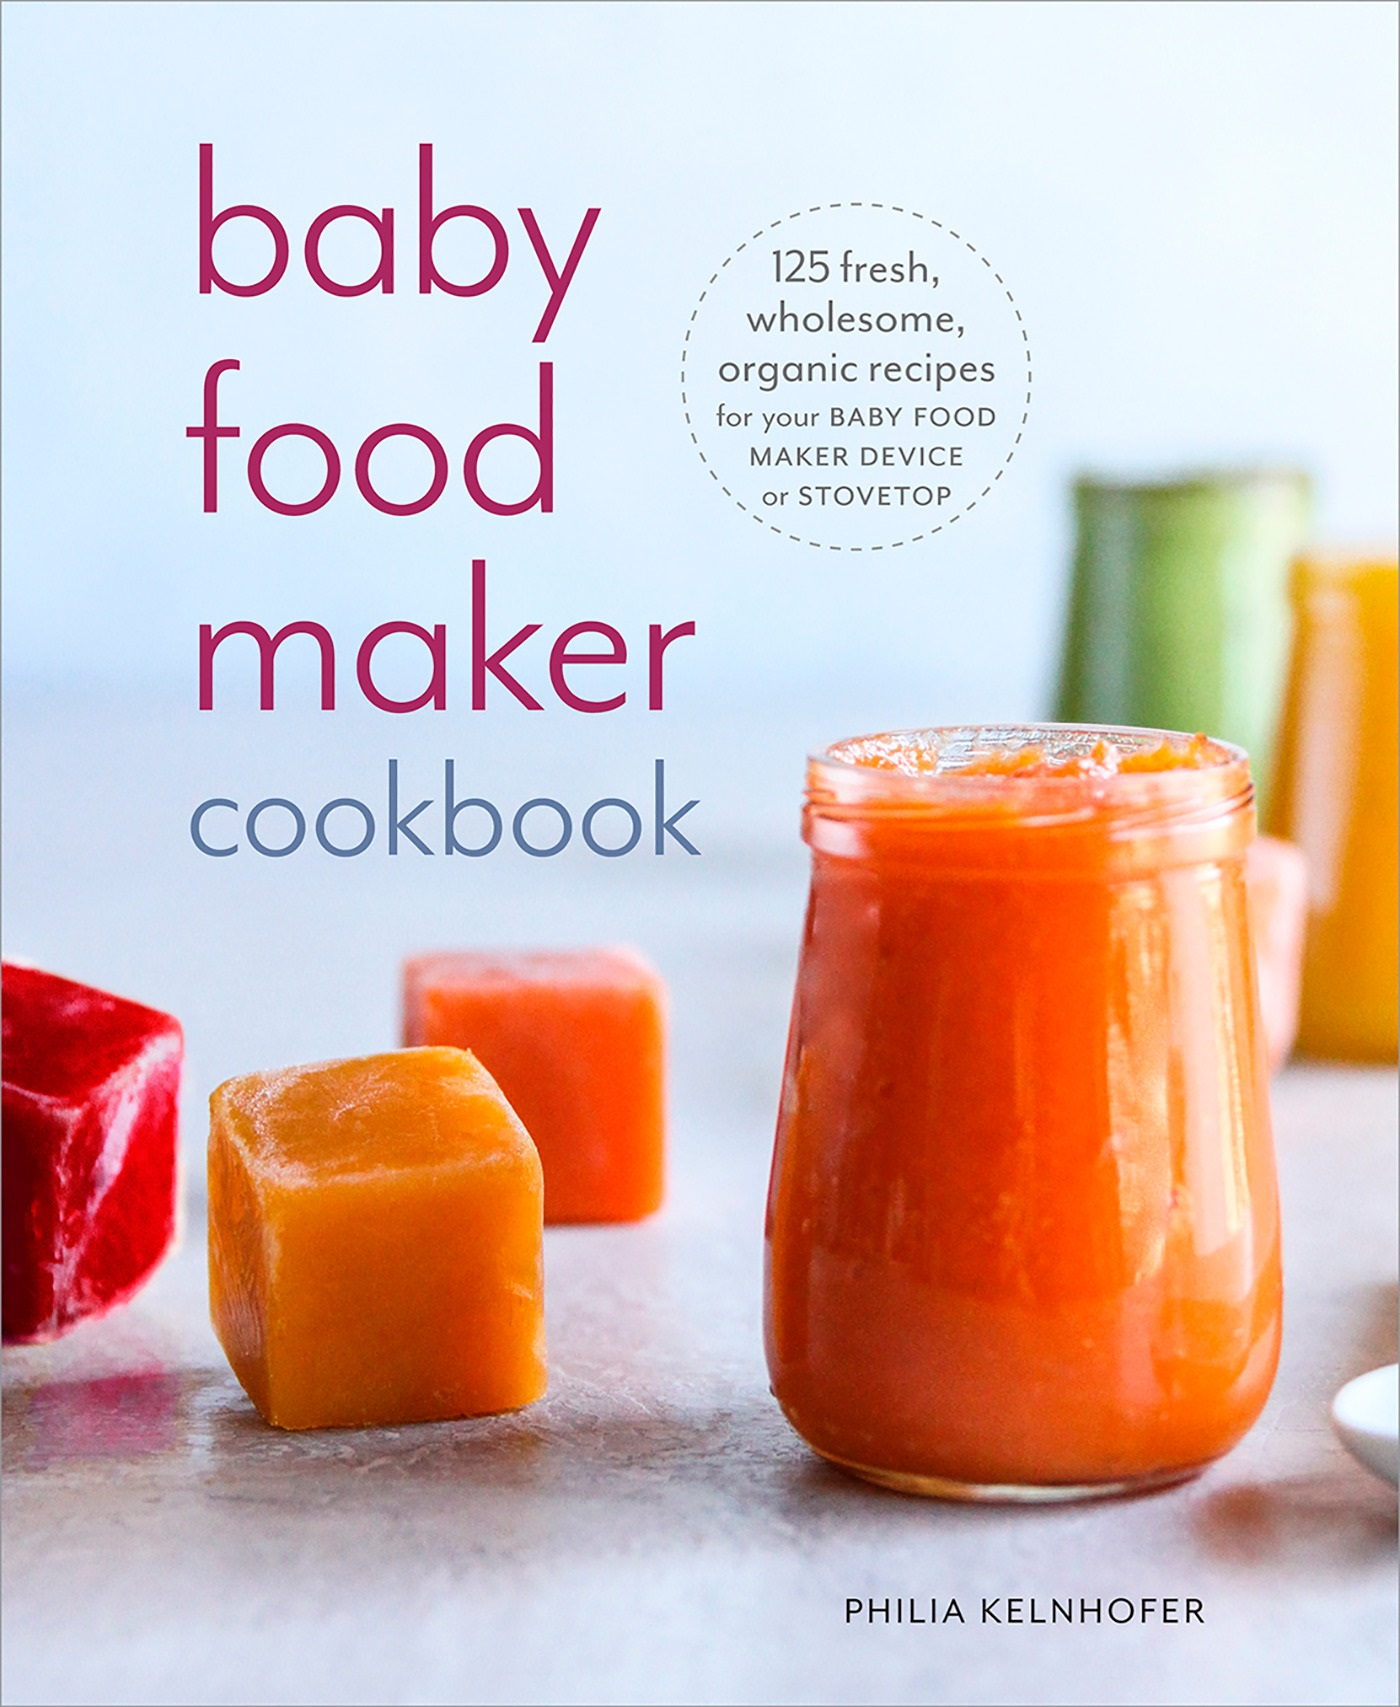 Baby Food Maker Cookbook Jacket.jpg